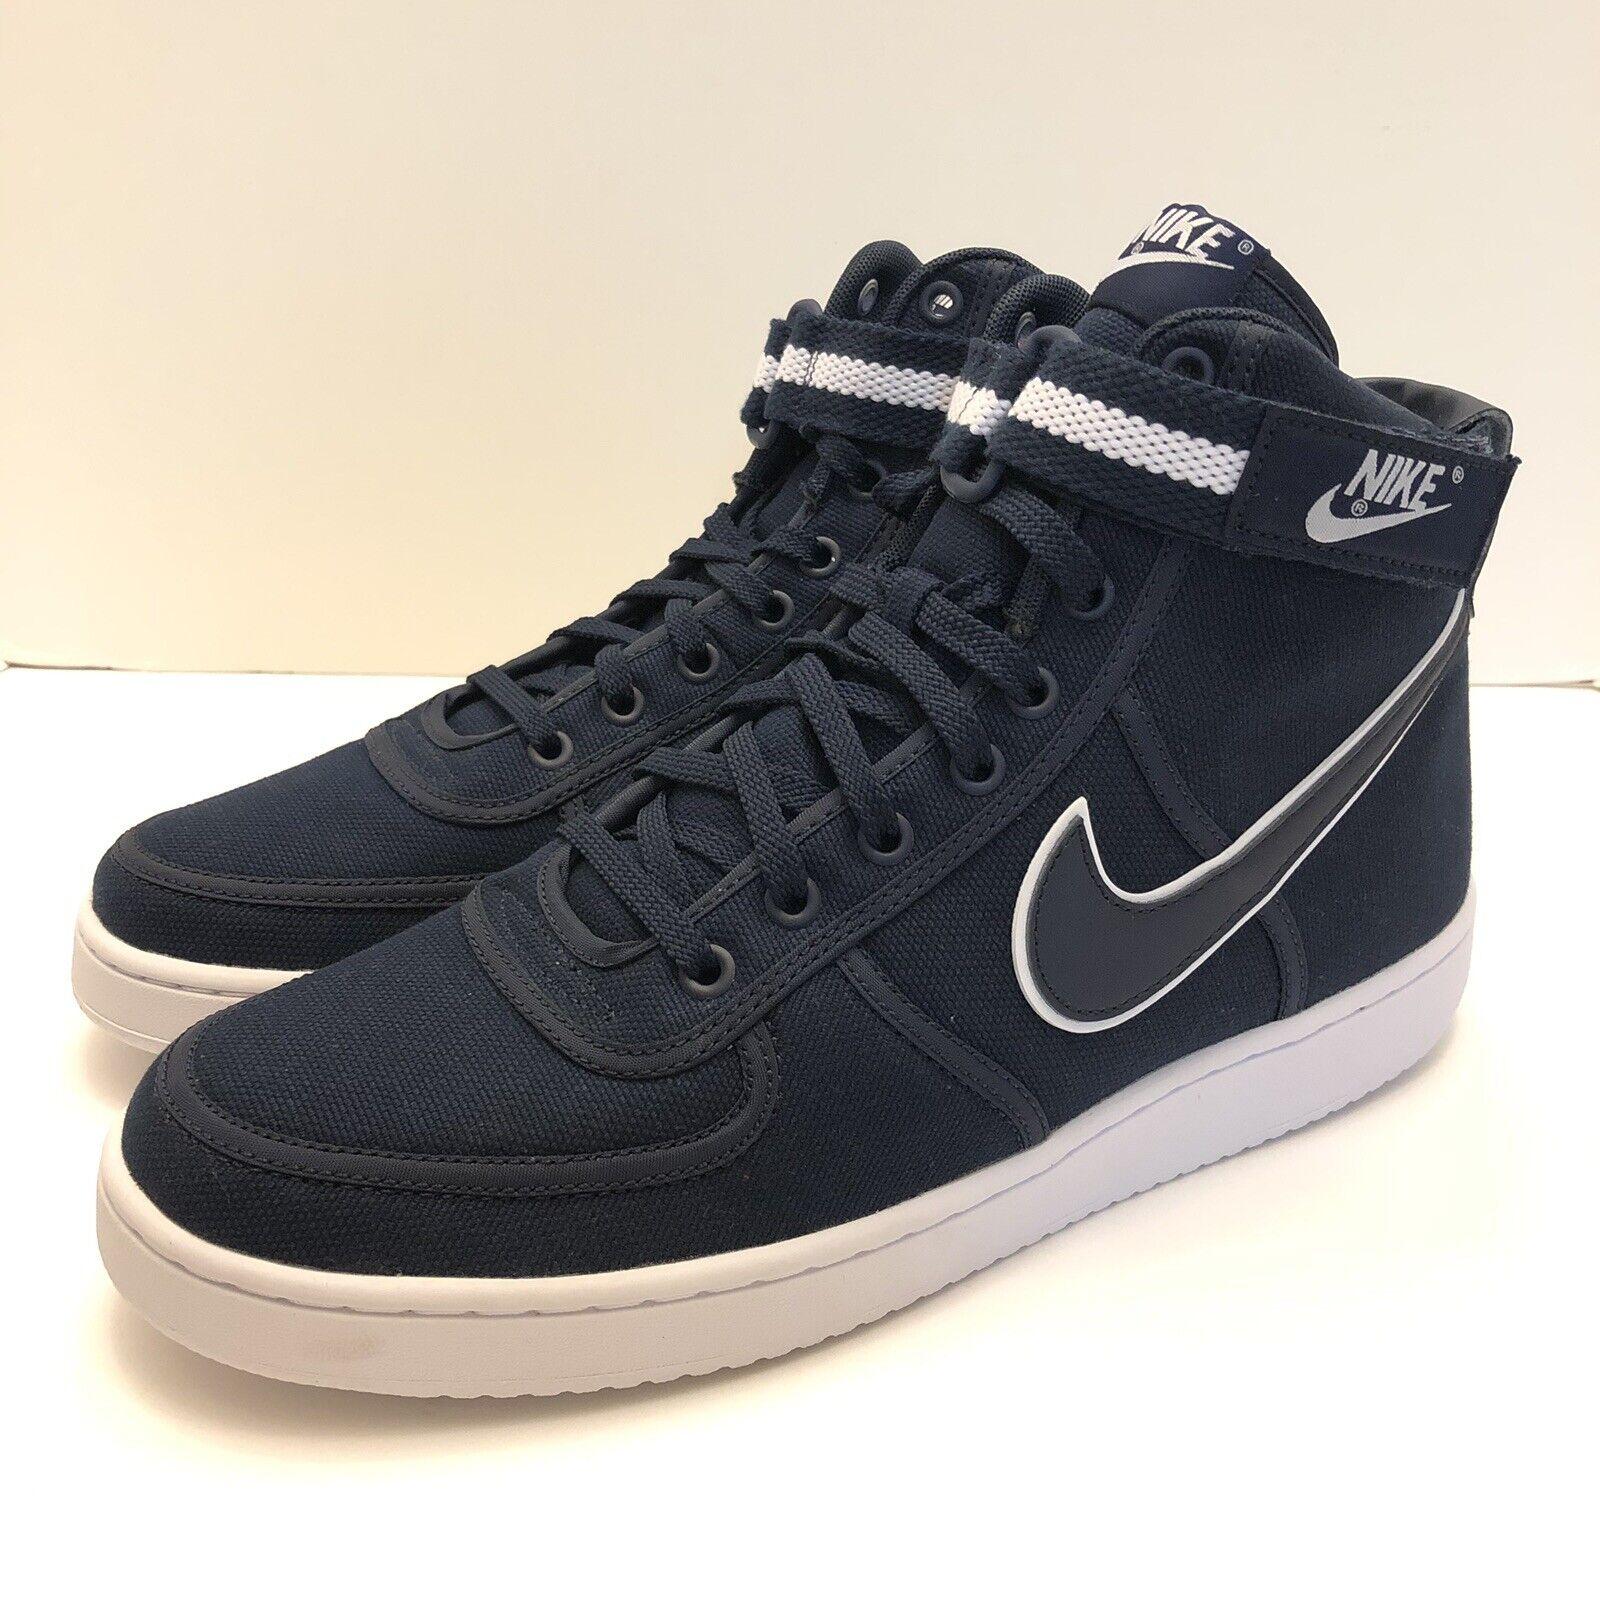 Nike Vandal High Supreme Casual shoes Obsidian White Mens Size 10.5 318330-402